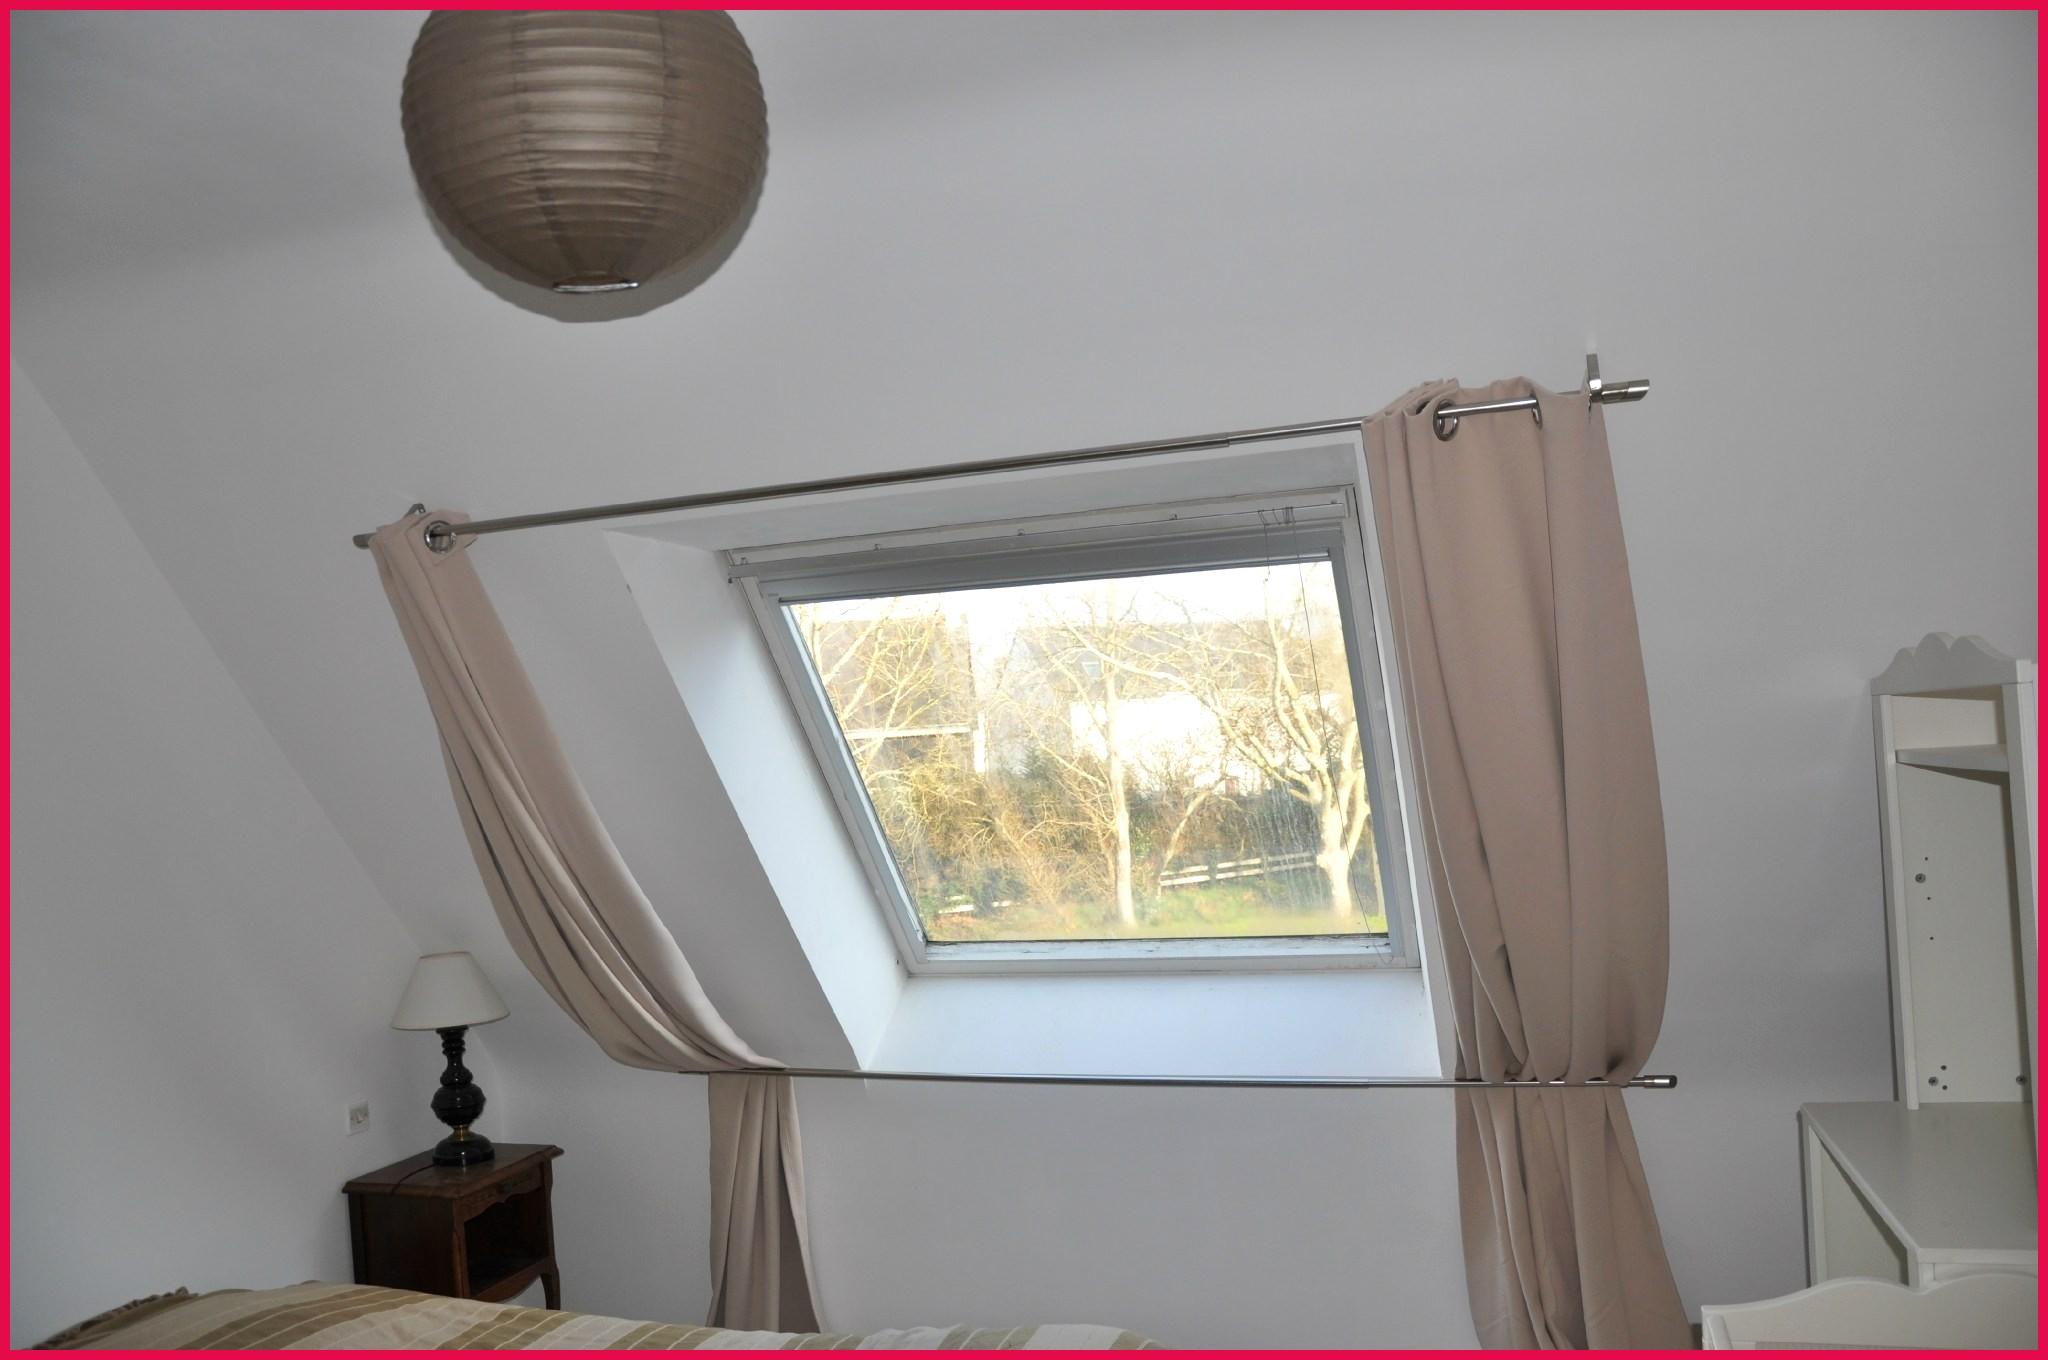 rideau occultant petite fenetre petite fenetre with. Black Bedroom Furniture Sets. Home Design Ideas